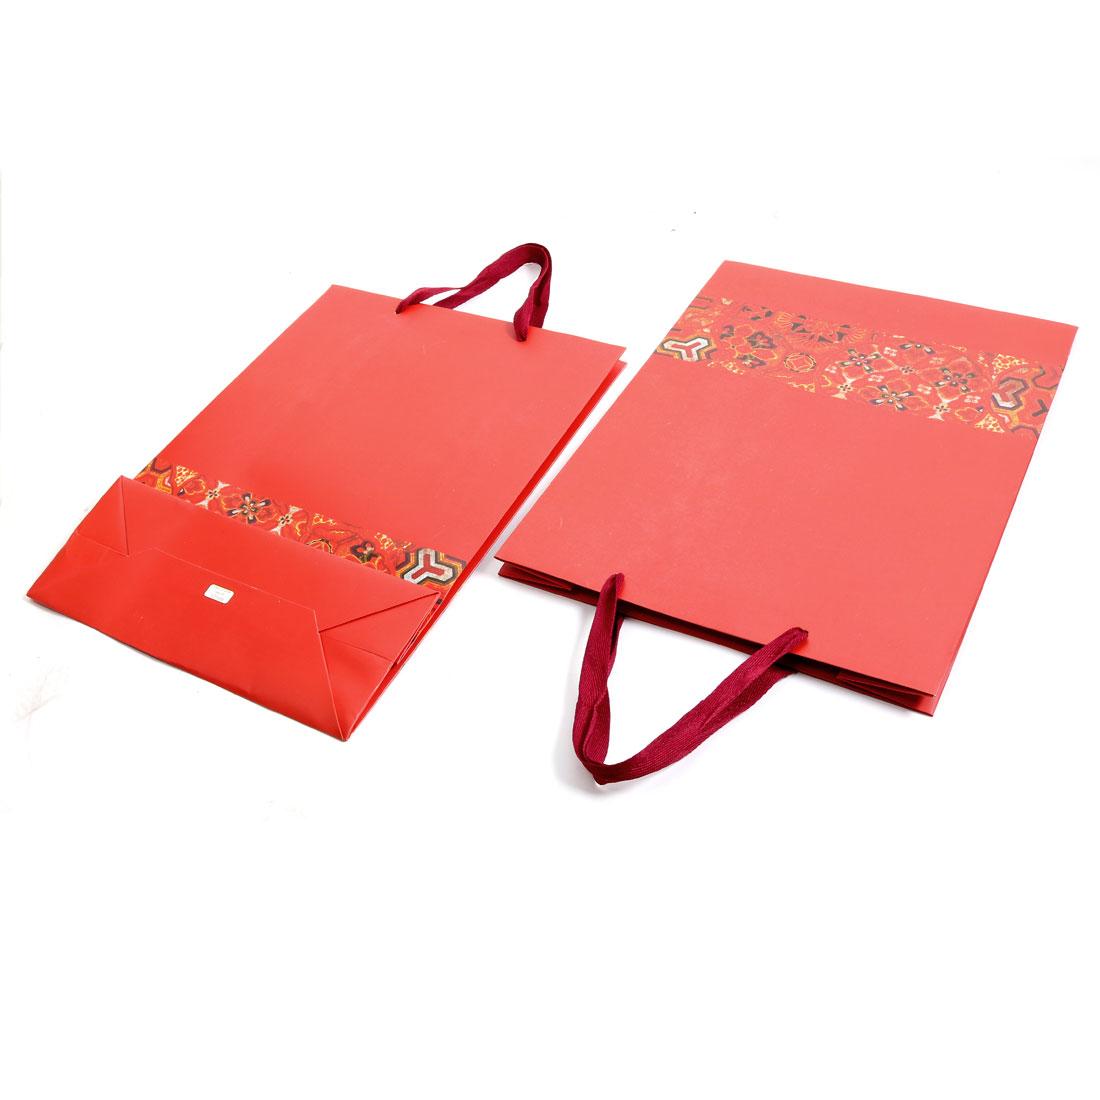 Boutique Retail Flower Pattern Foldable Handbag Wrapper Gift Bags Red 2 PCS